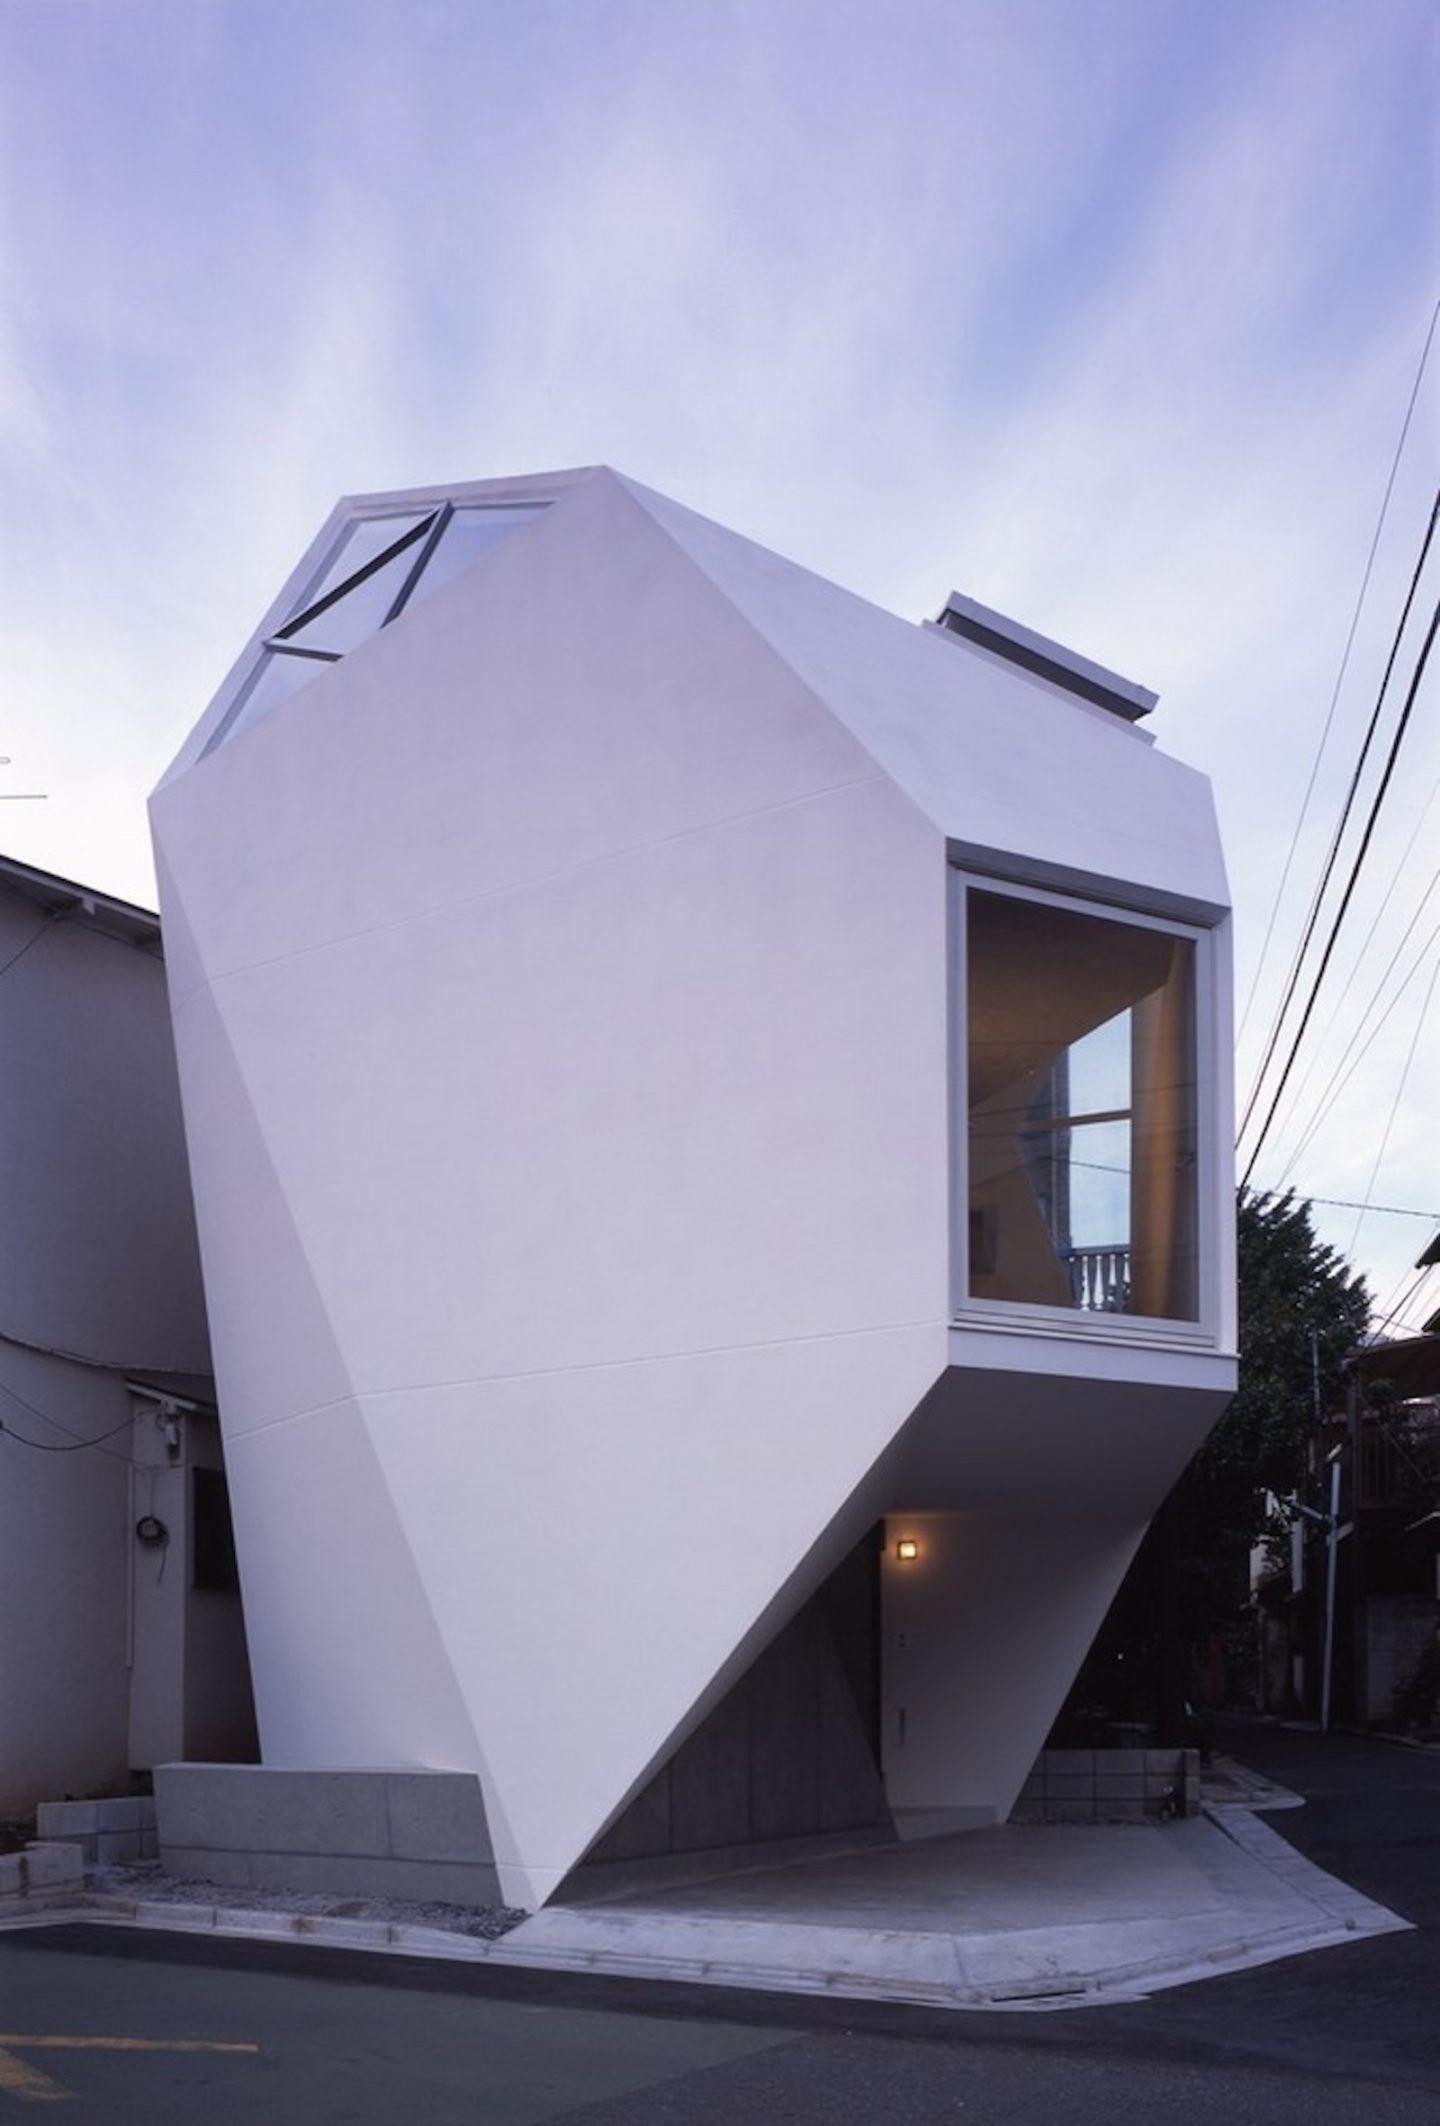 IGNANT-Architecture-Atelier-Tekuto-Reflection-Of-Mineral-003